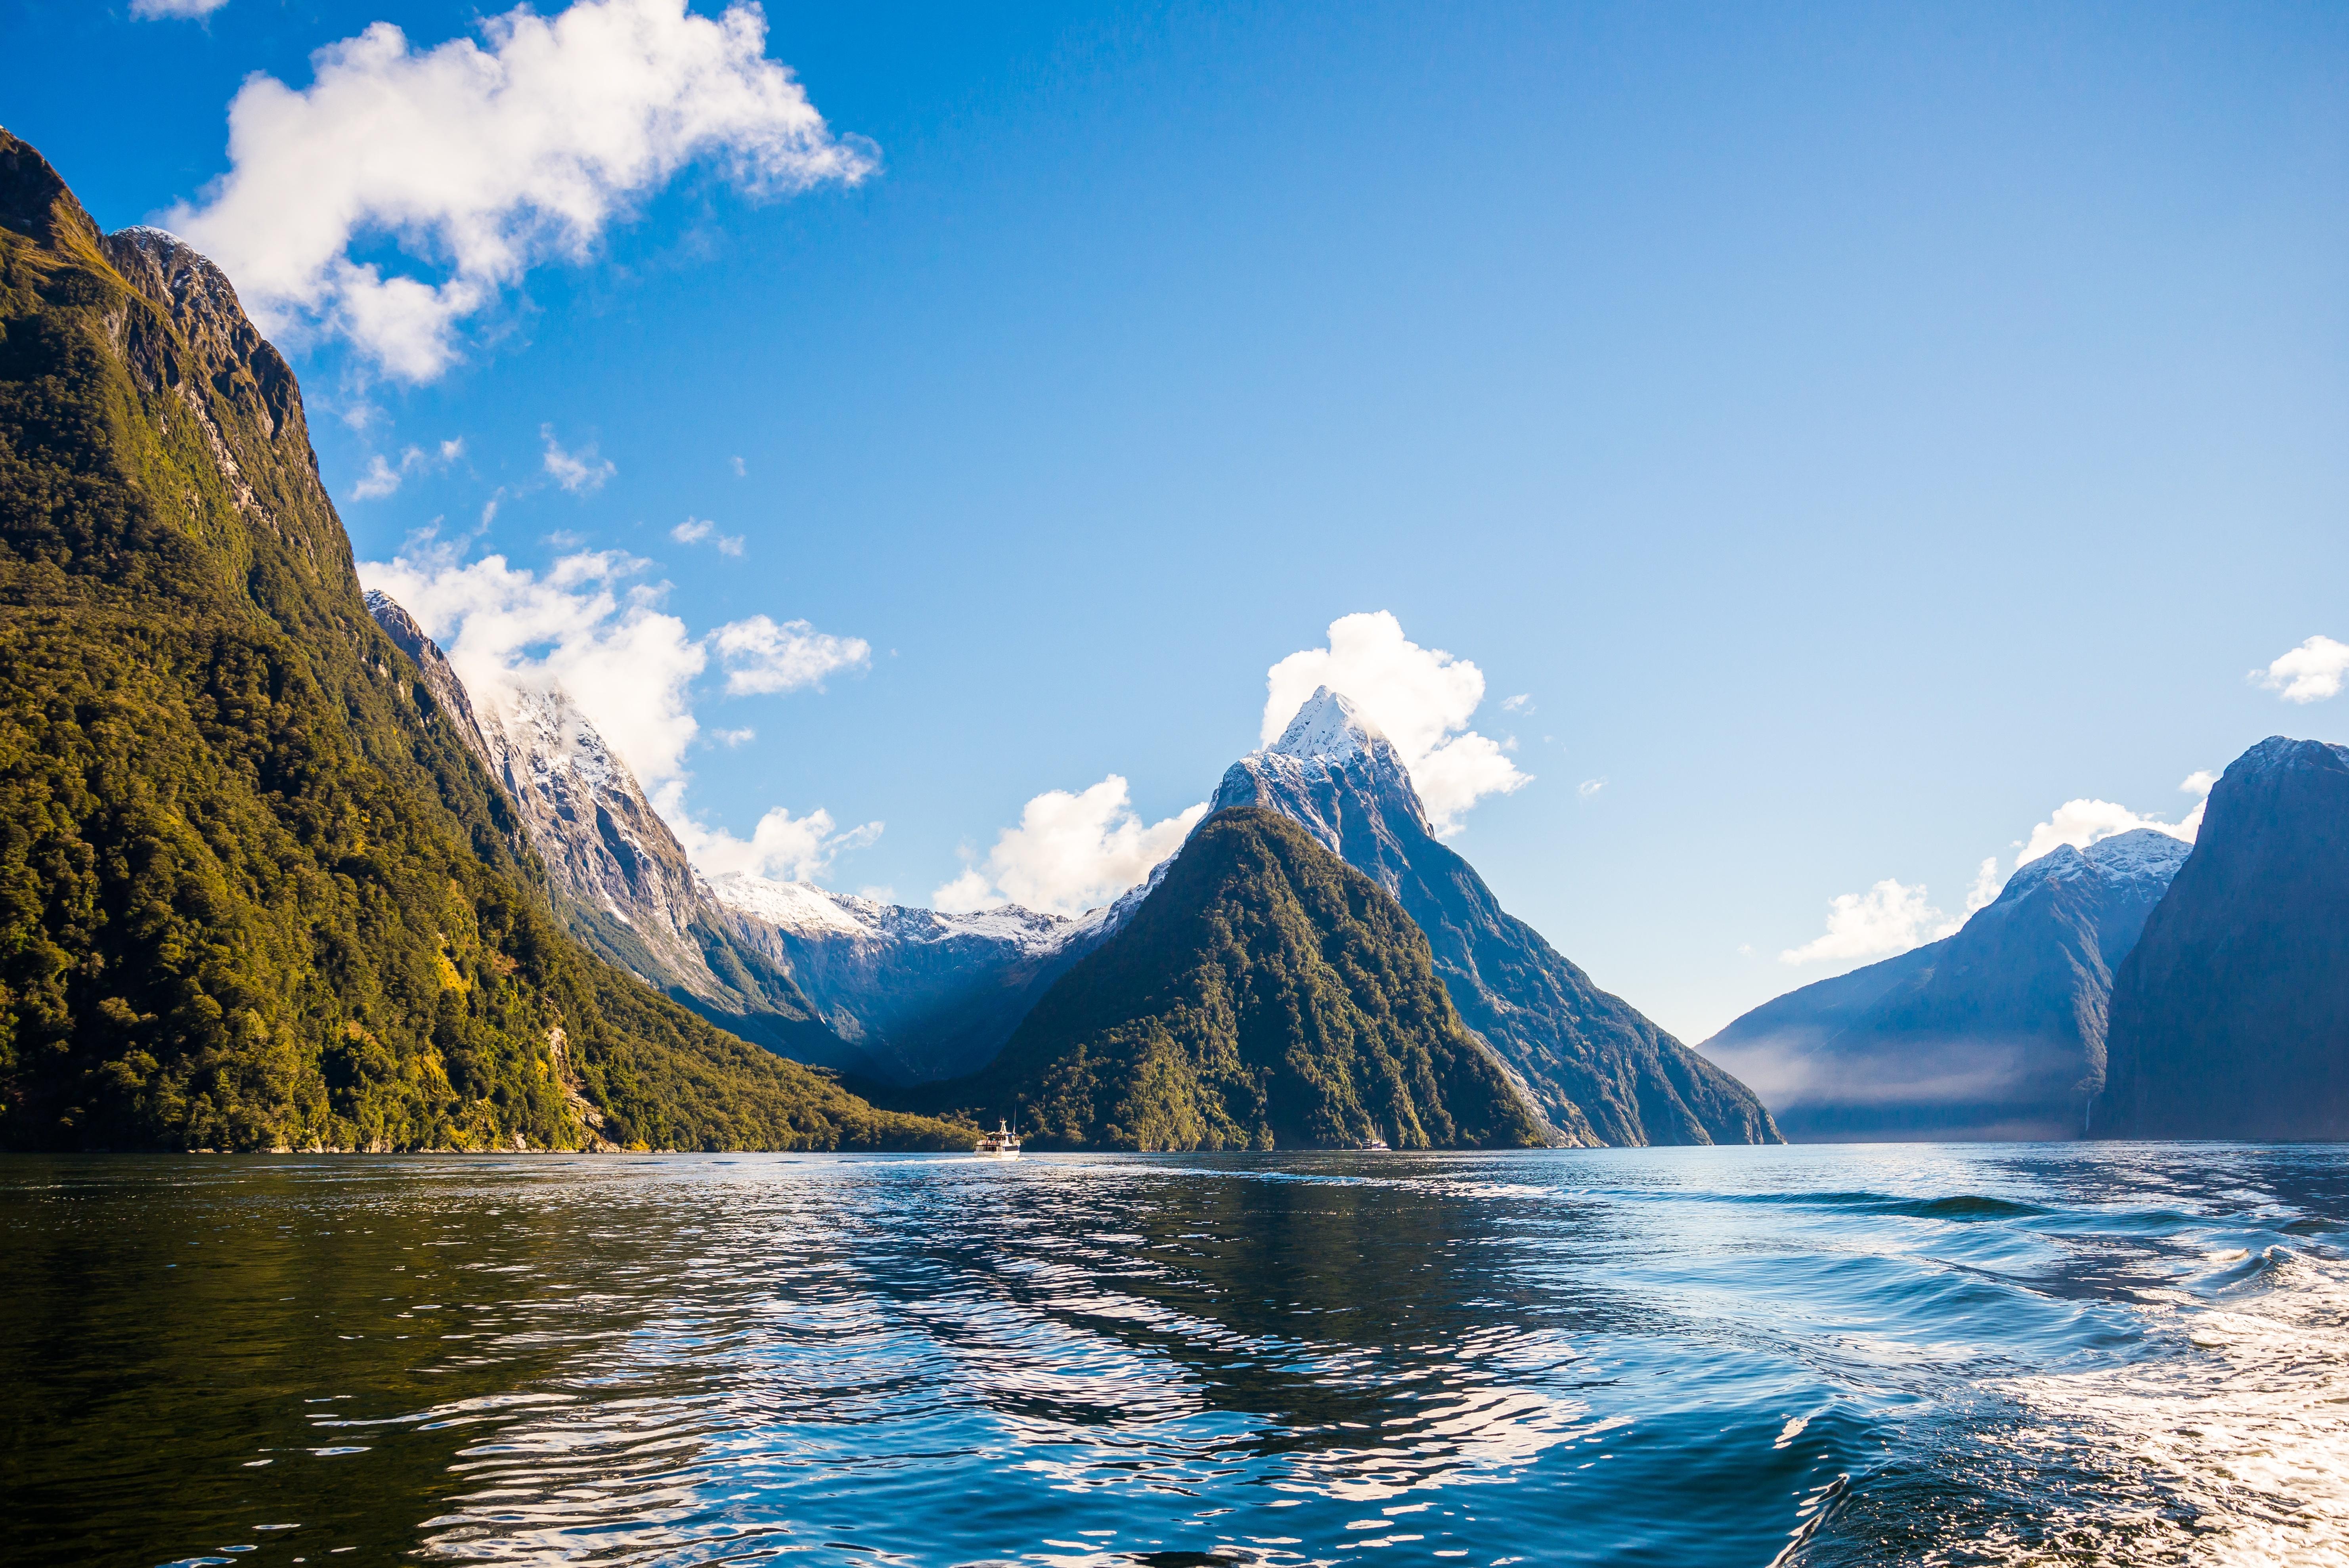 Nuova Zelanda Viaggi Mare Paesaggi 4 Alidays